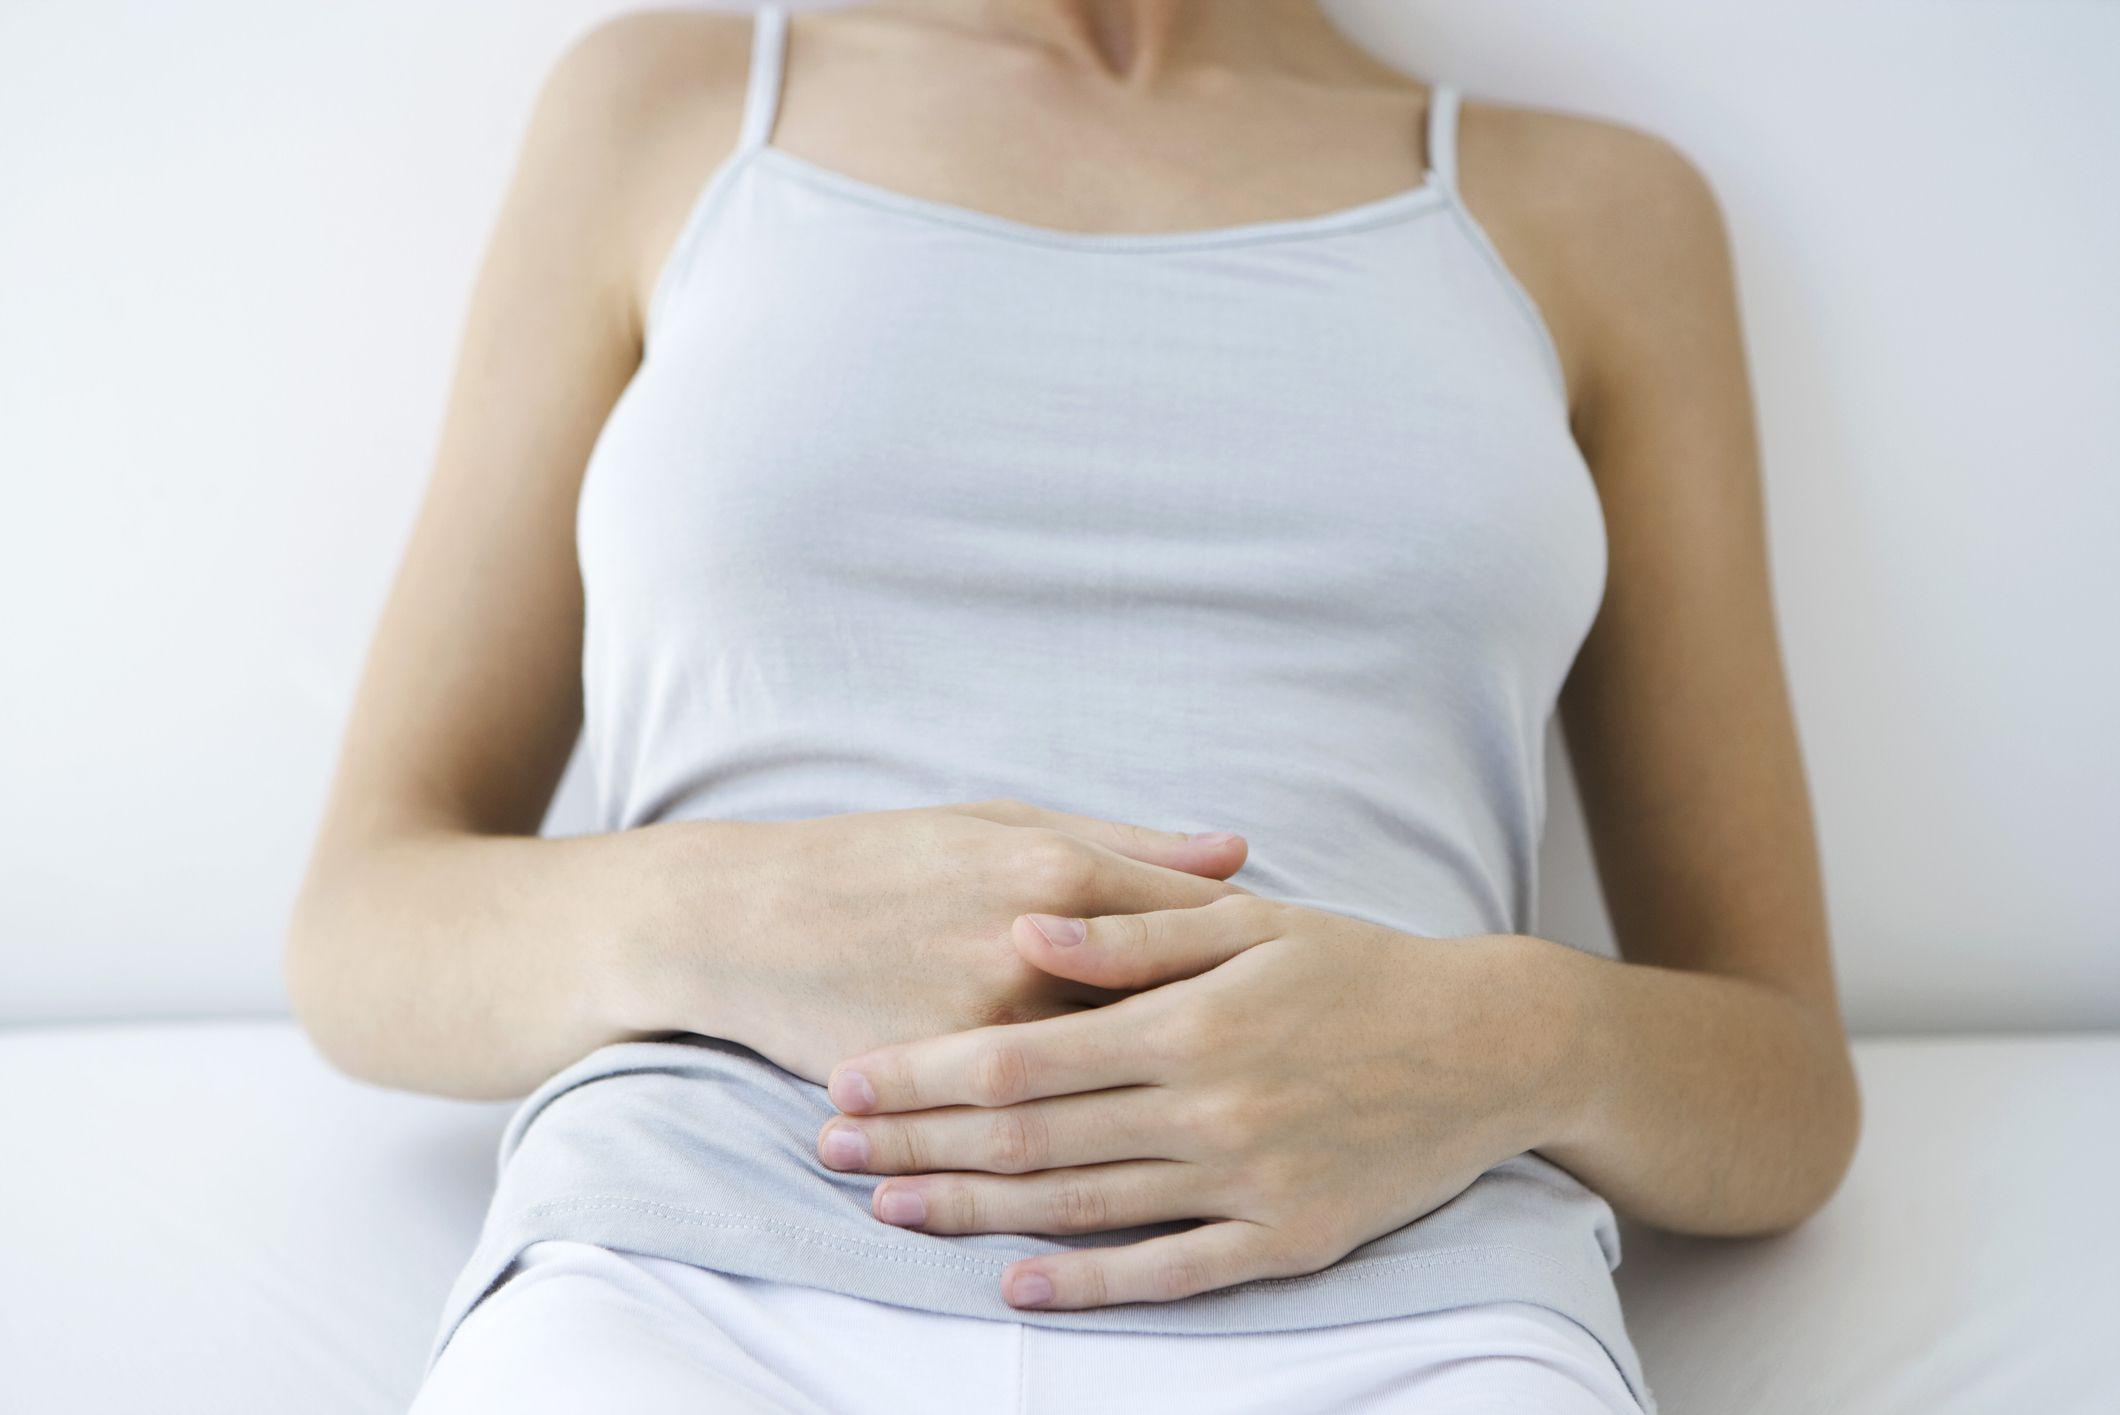 woman holding abdomen while sitting